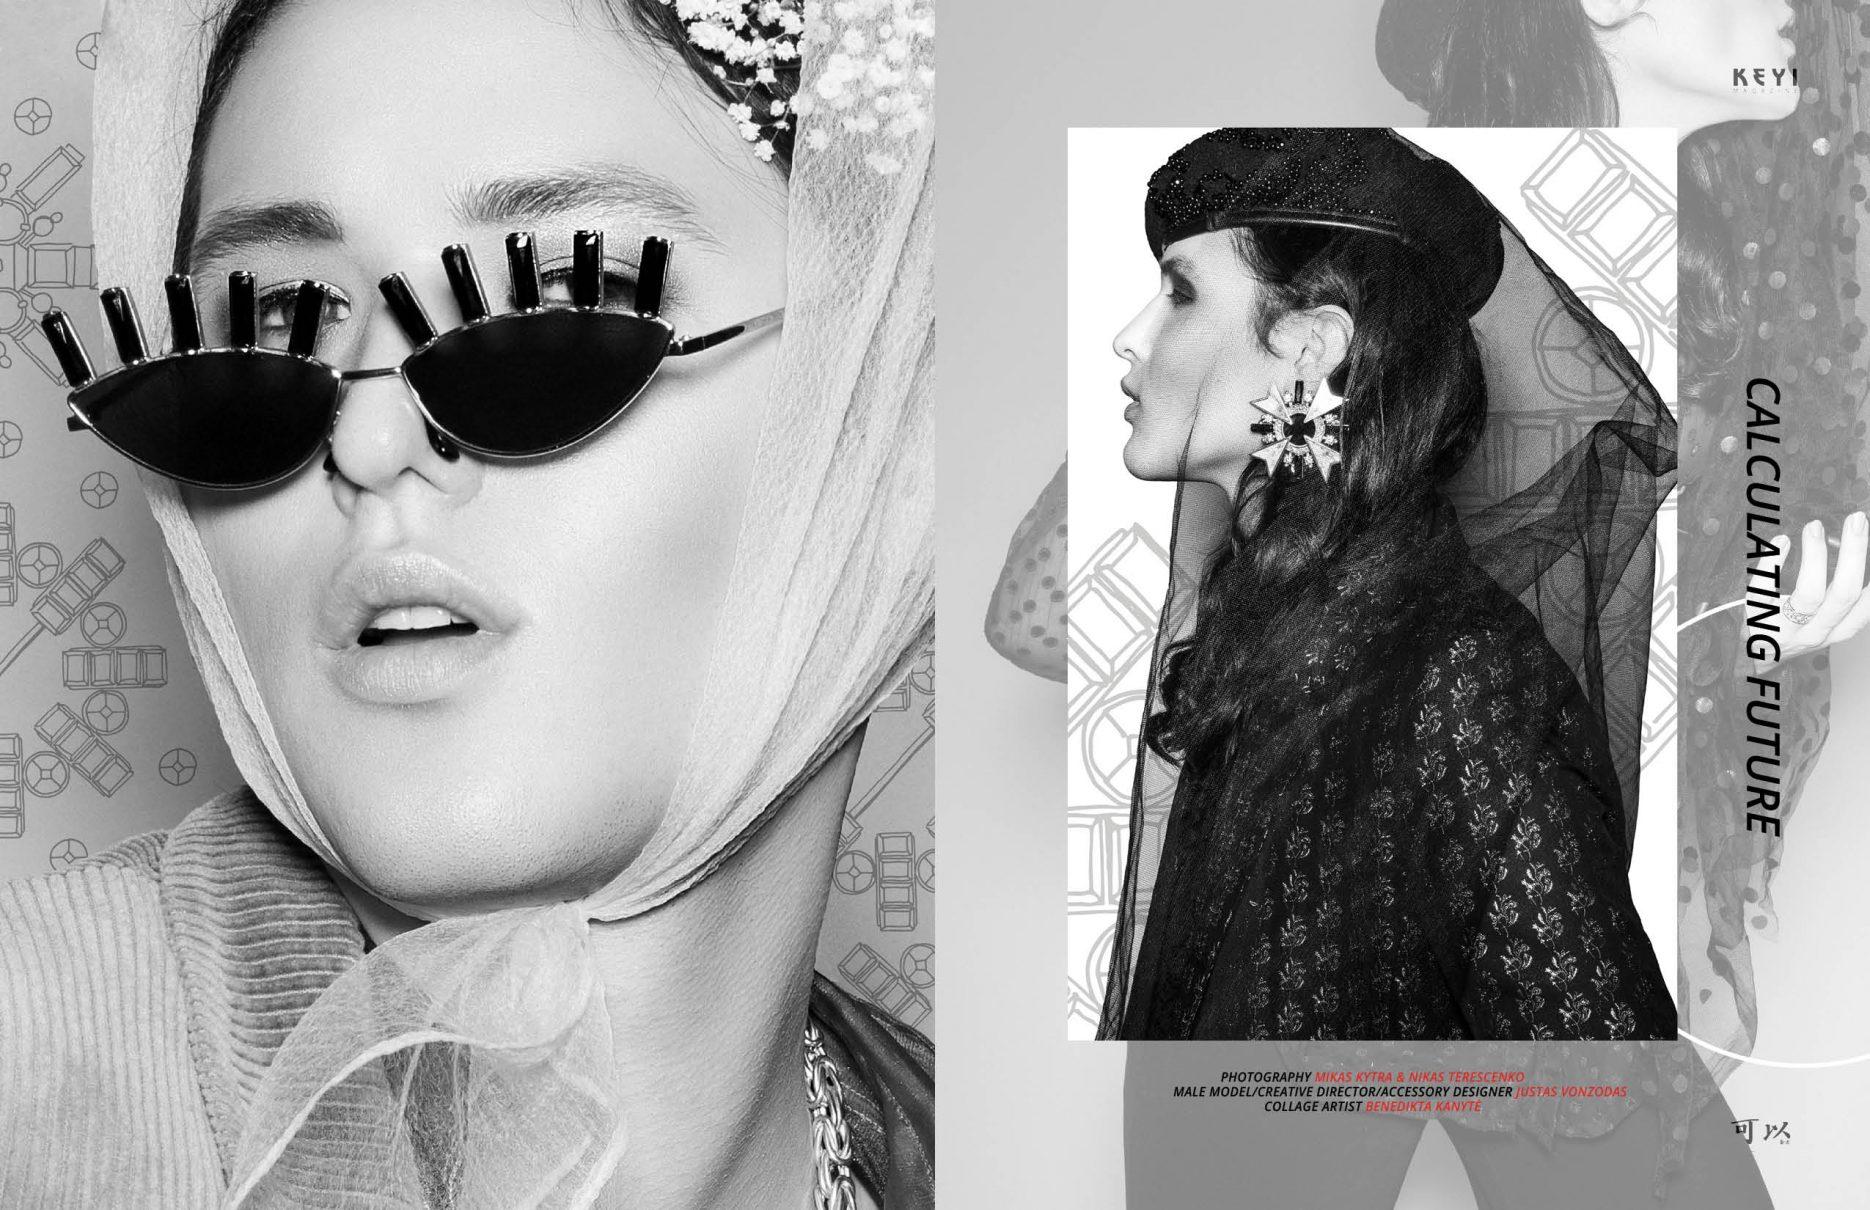 fashion photoshoot for keyi magazine berlin by mikita